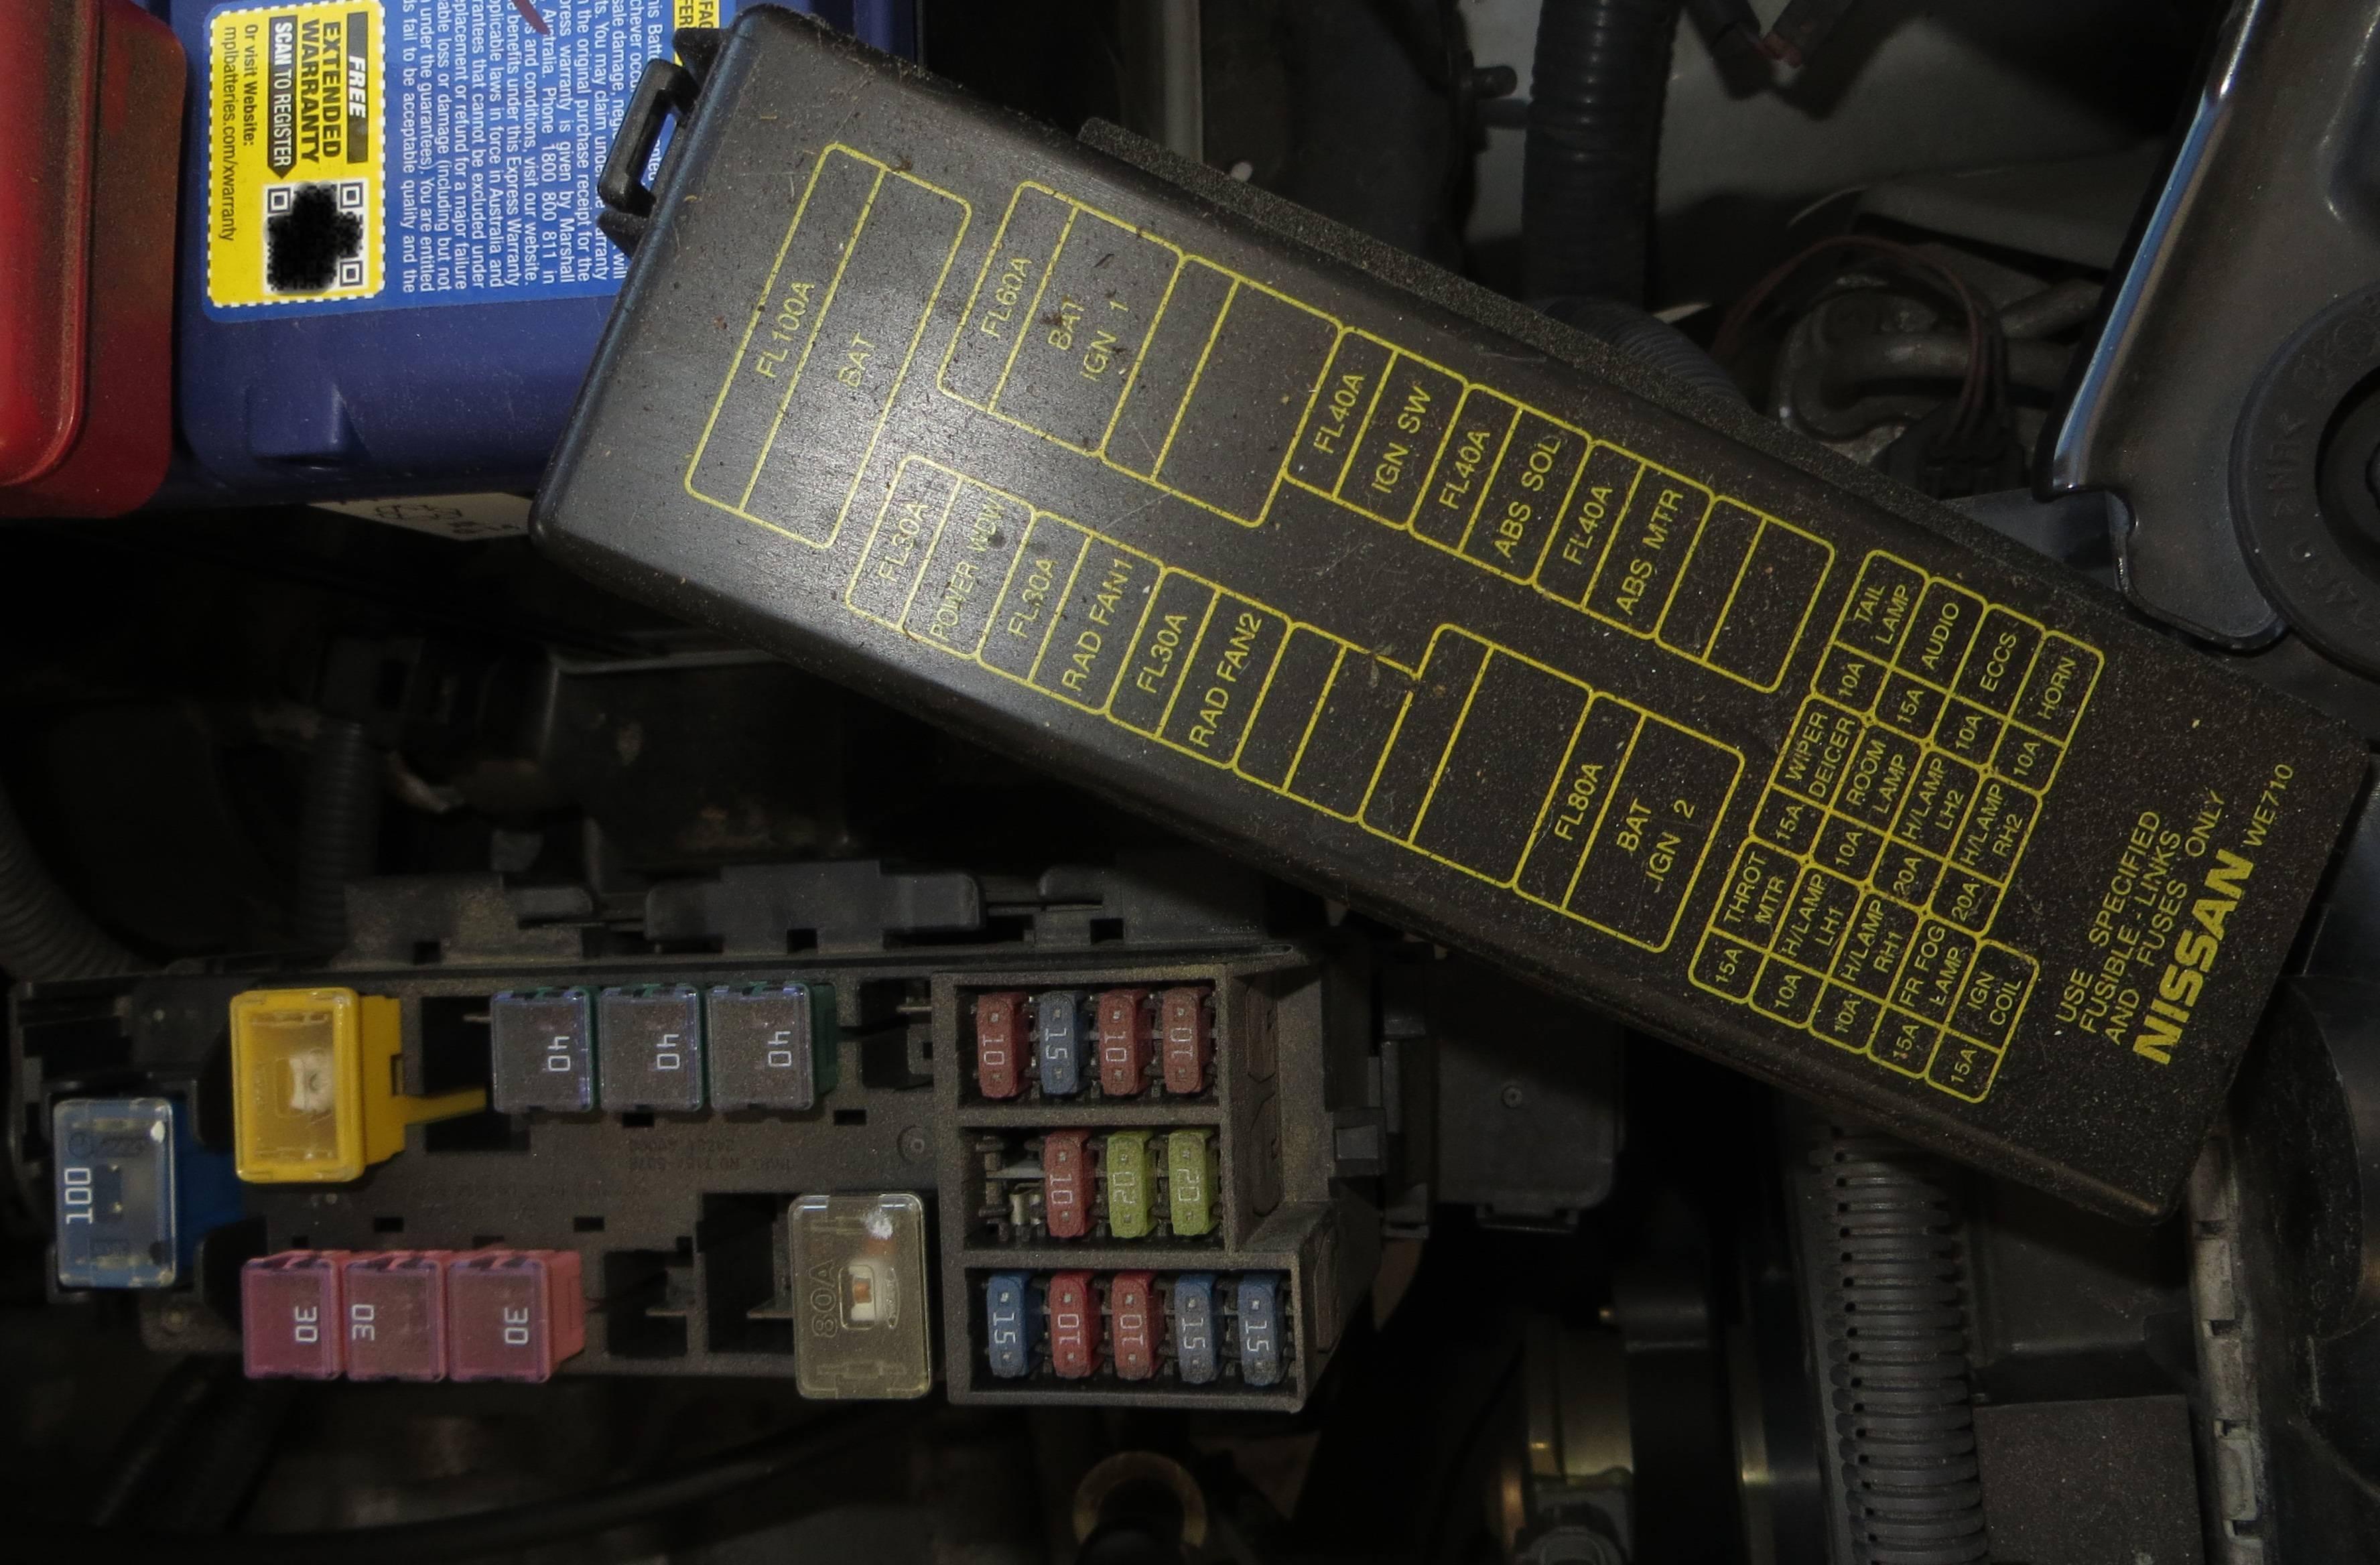 [DIAGRAM_1JK]  Nissan B12 Fuse Box - 5e Cat 6 Wiring Diagram for Wiring Diagram Schematics | Nissan B12 Fuse Box |  | Wiring Diagram Schematics